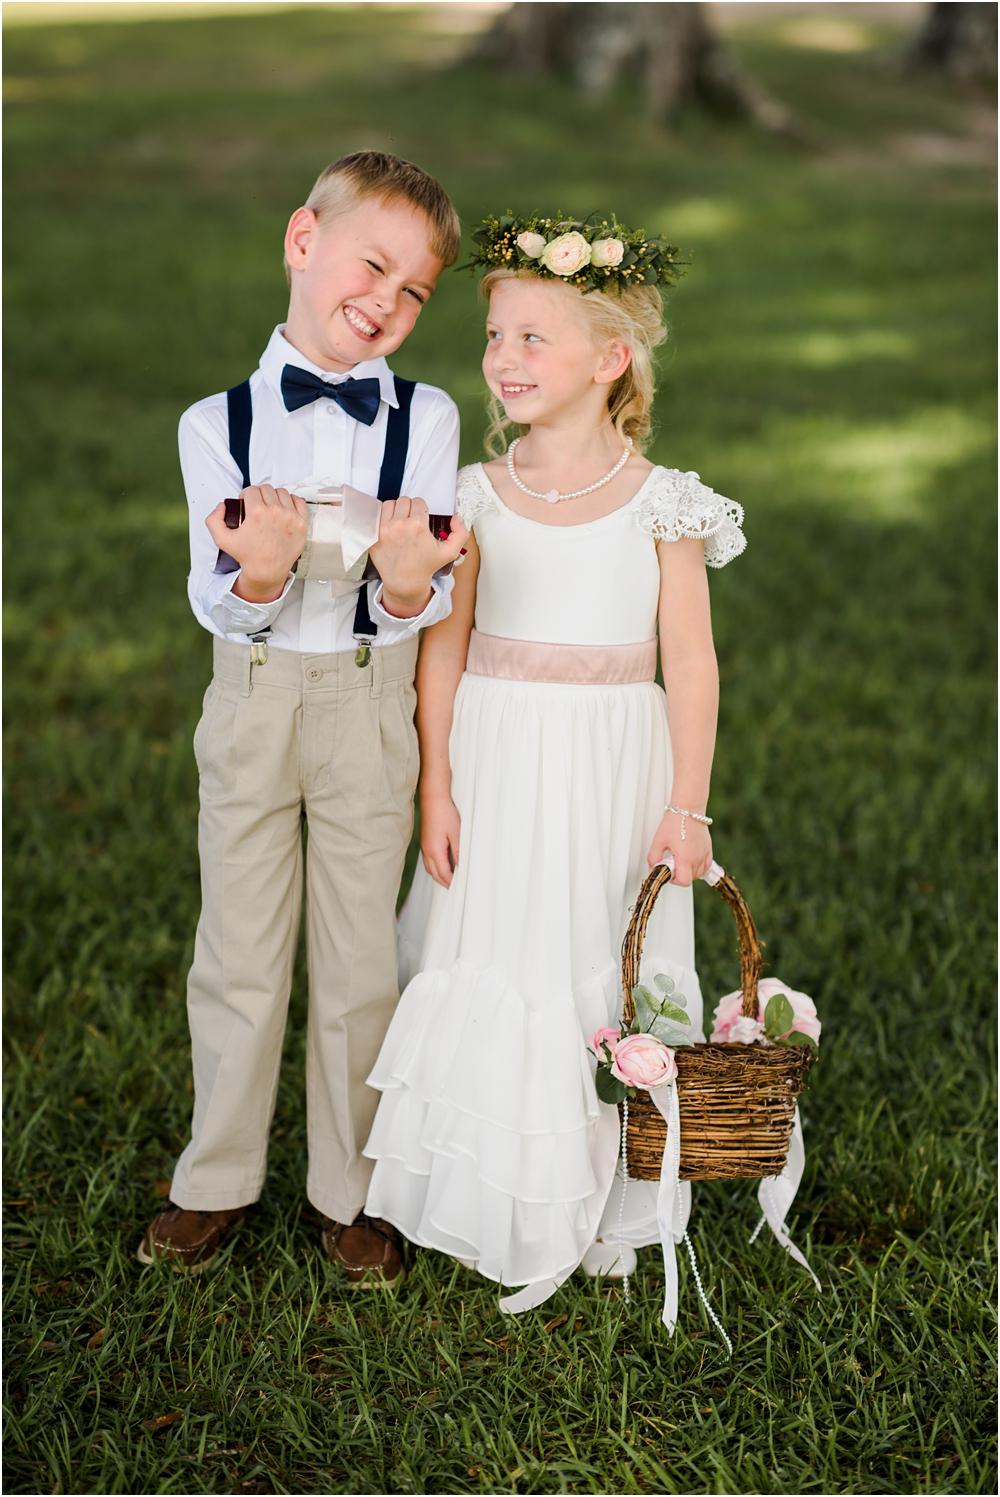 marianna-florida-wedding-photographer-kiersten-grant-94.jpg